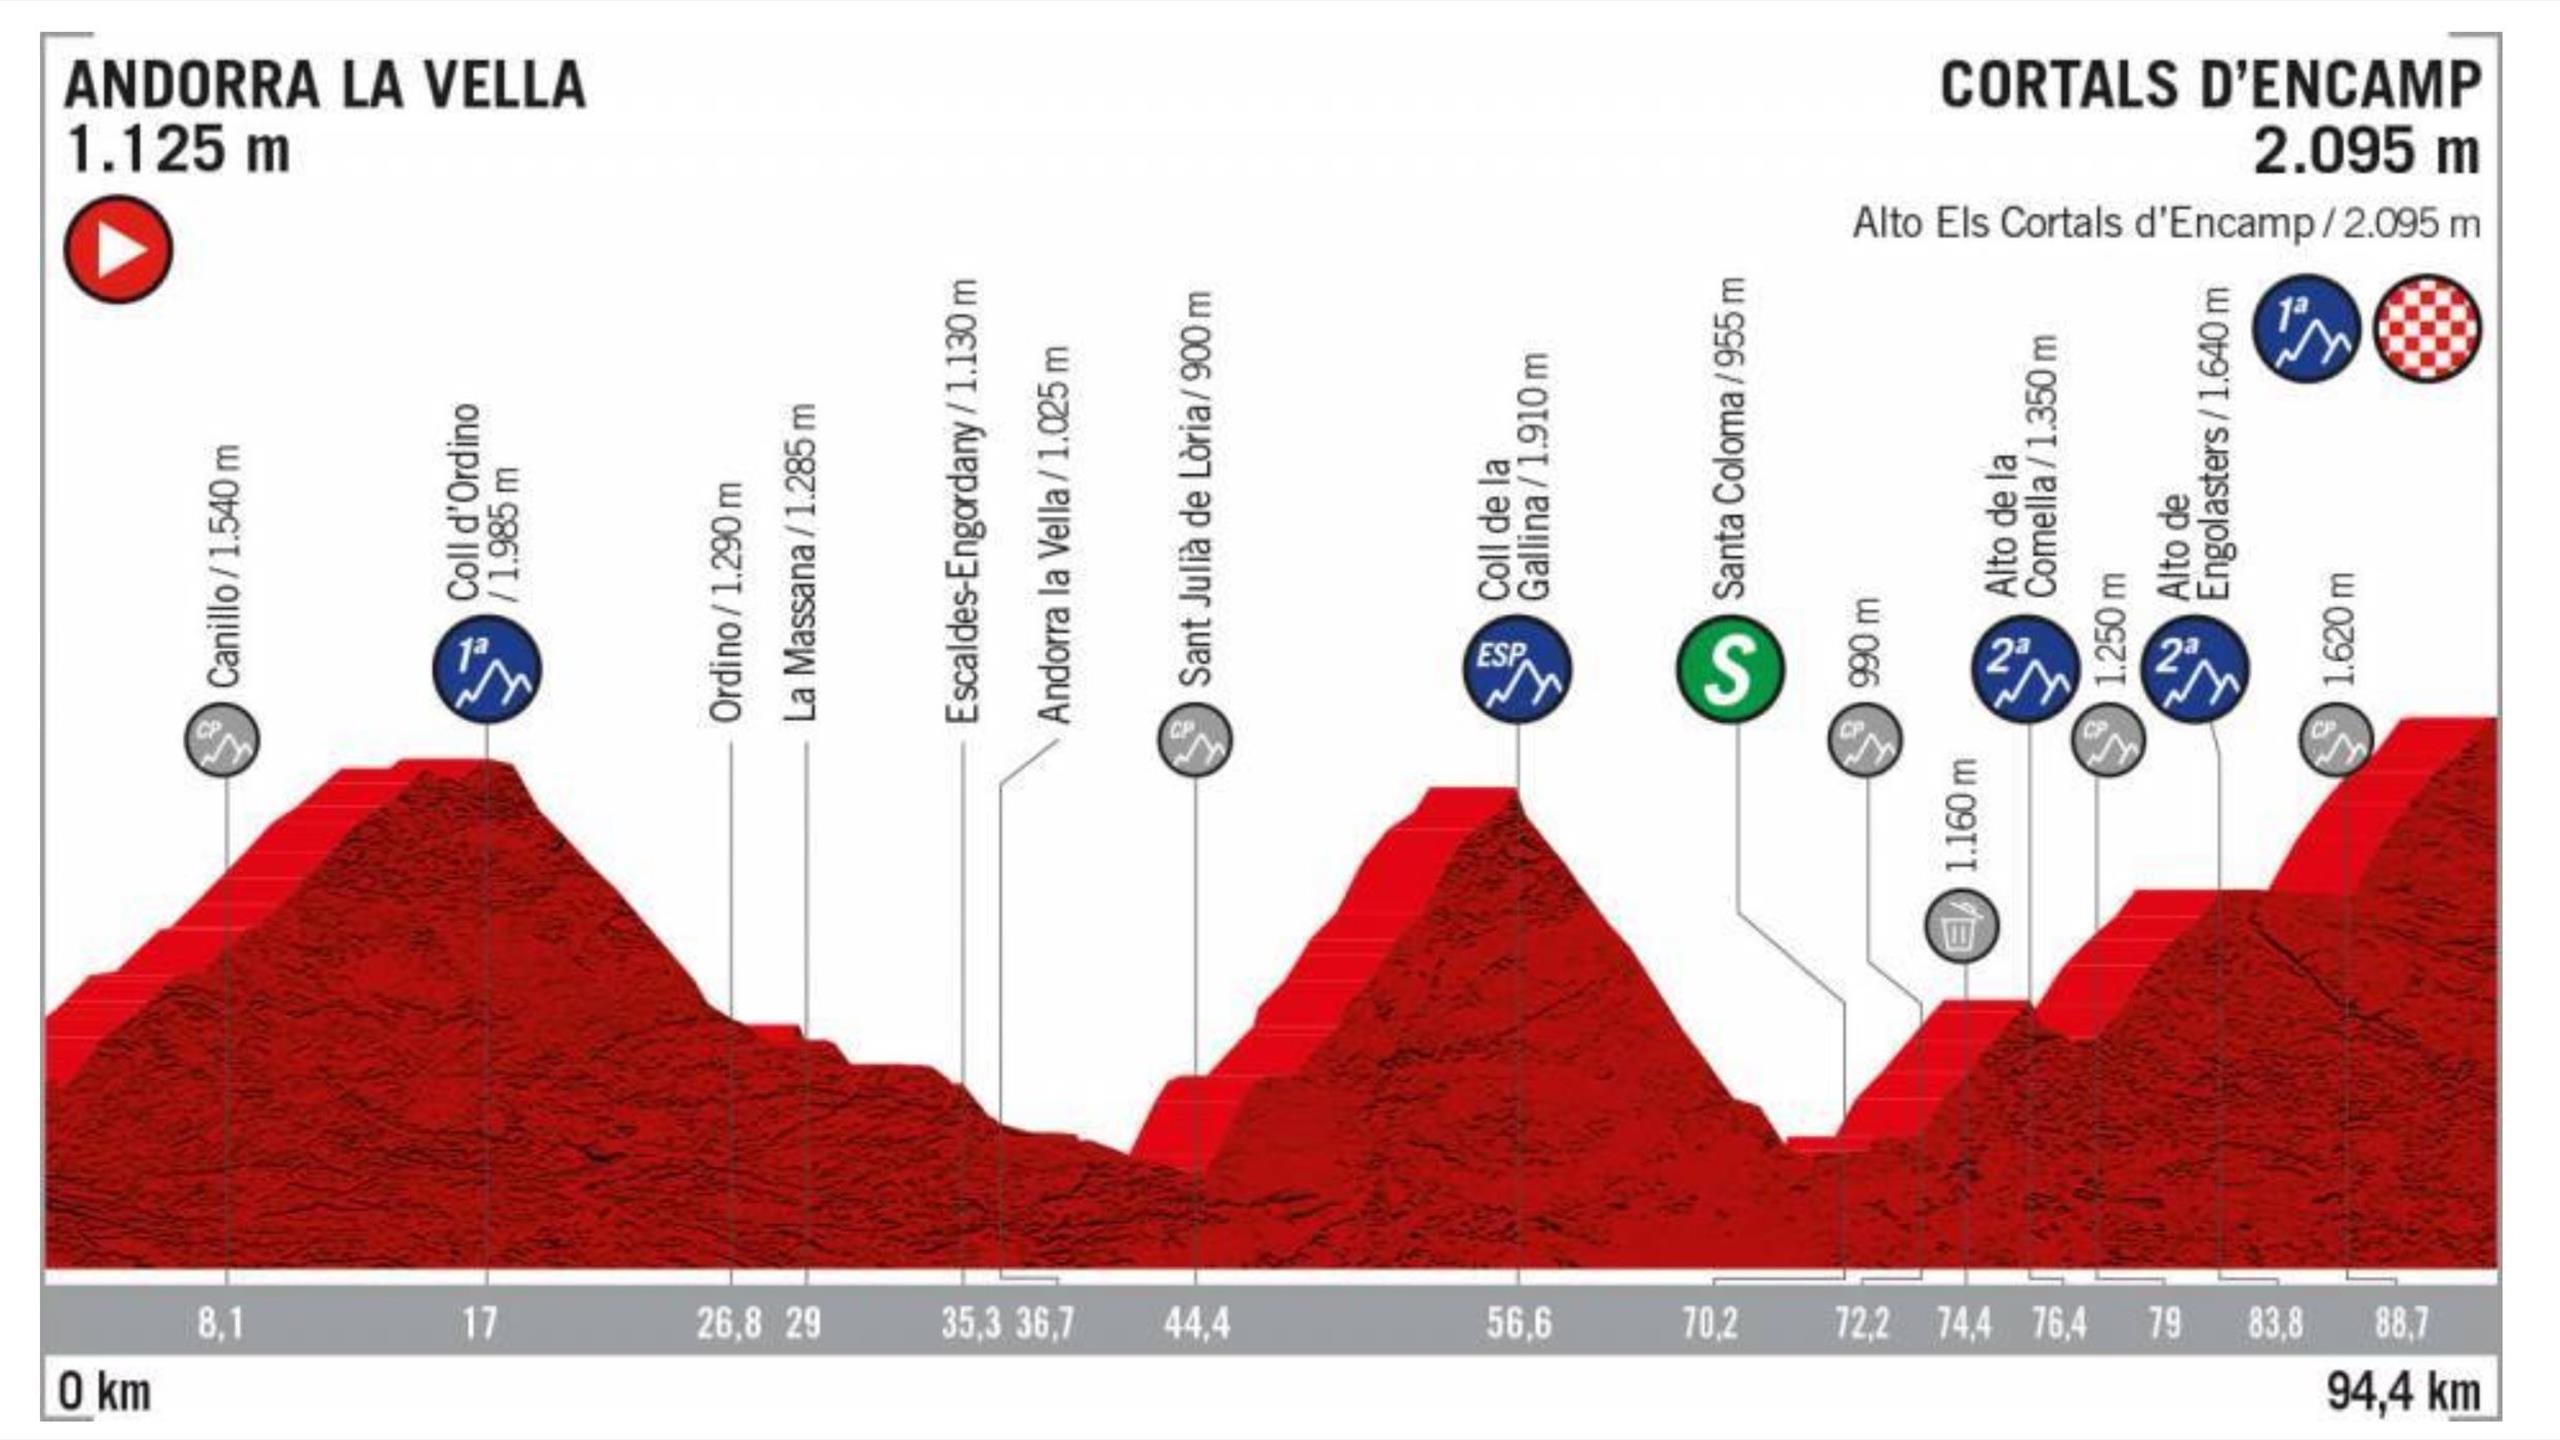 La Vuelta A Espana 2019 Stage 9 Profile Route And Map Andorra La Vella To Cortals D Encamp Eurosport